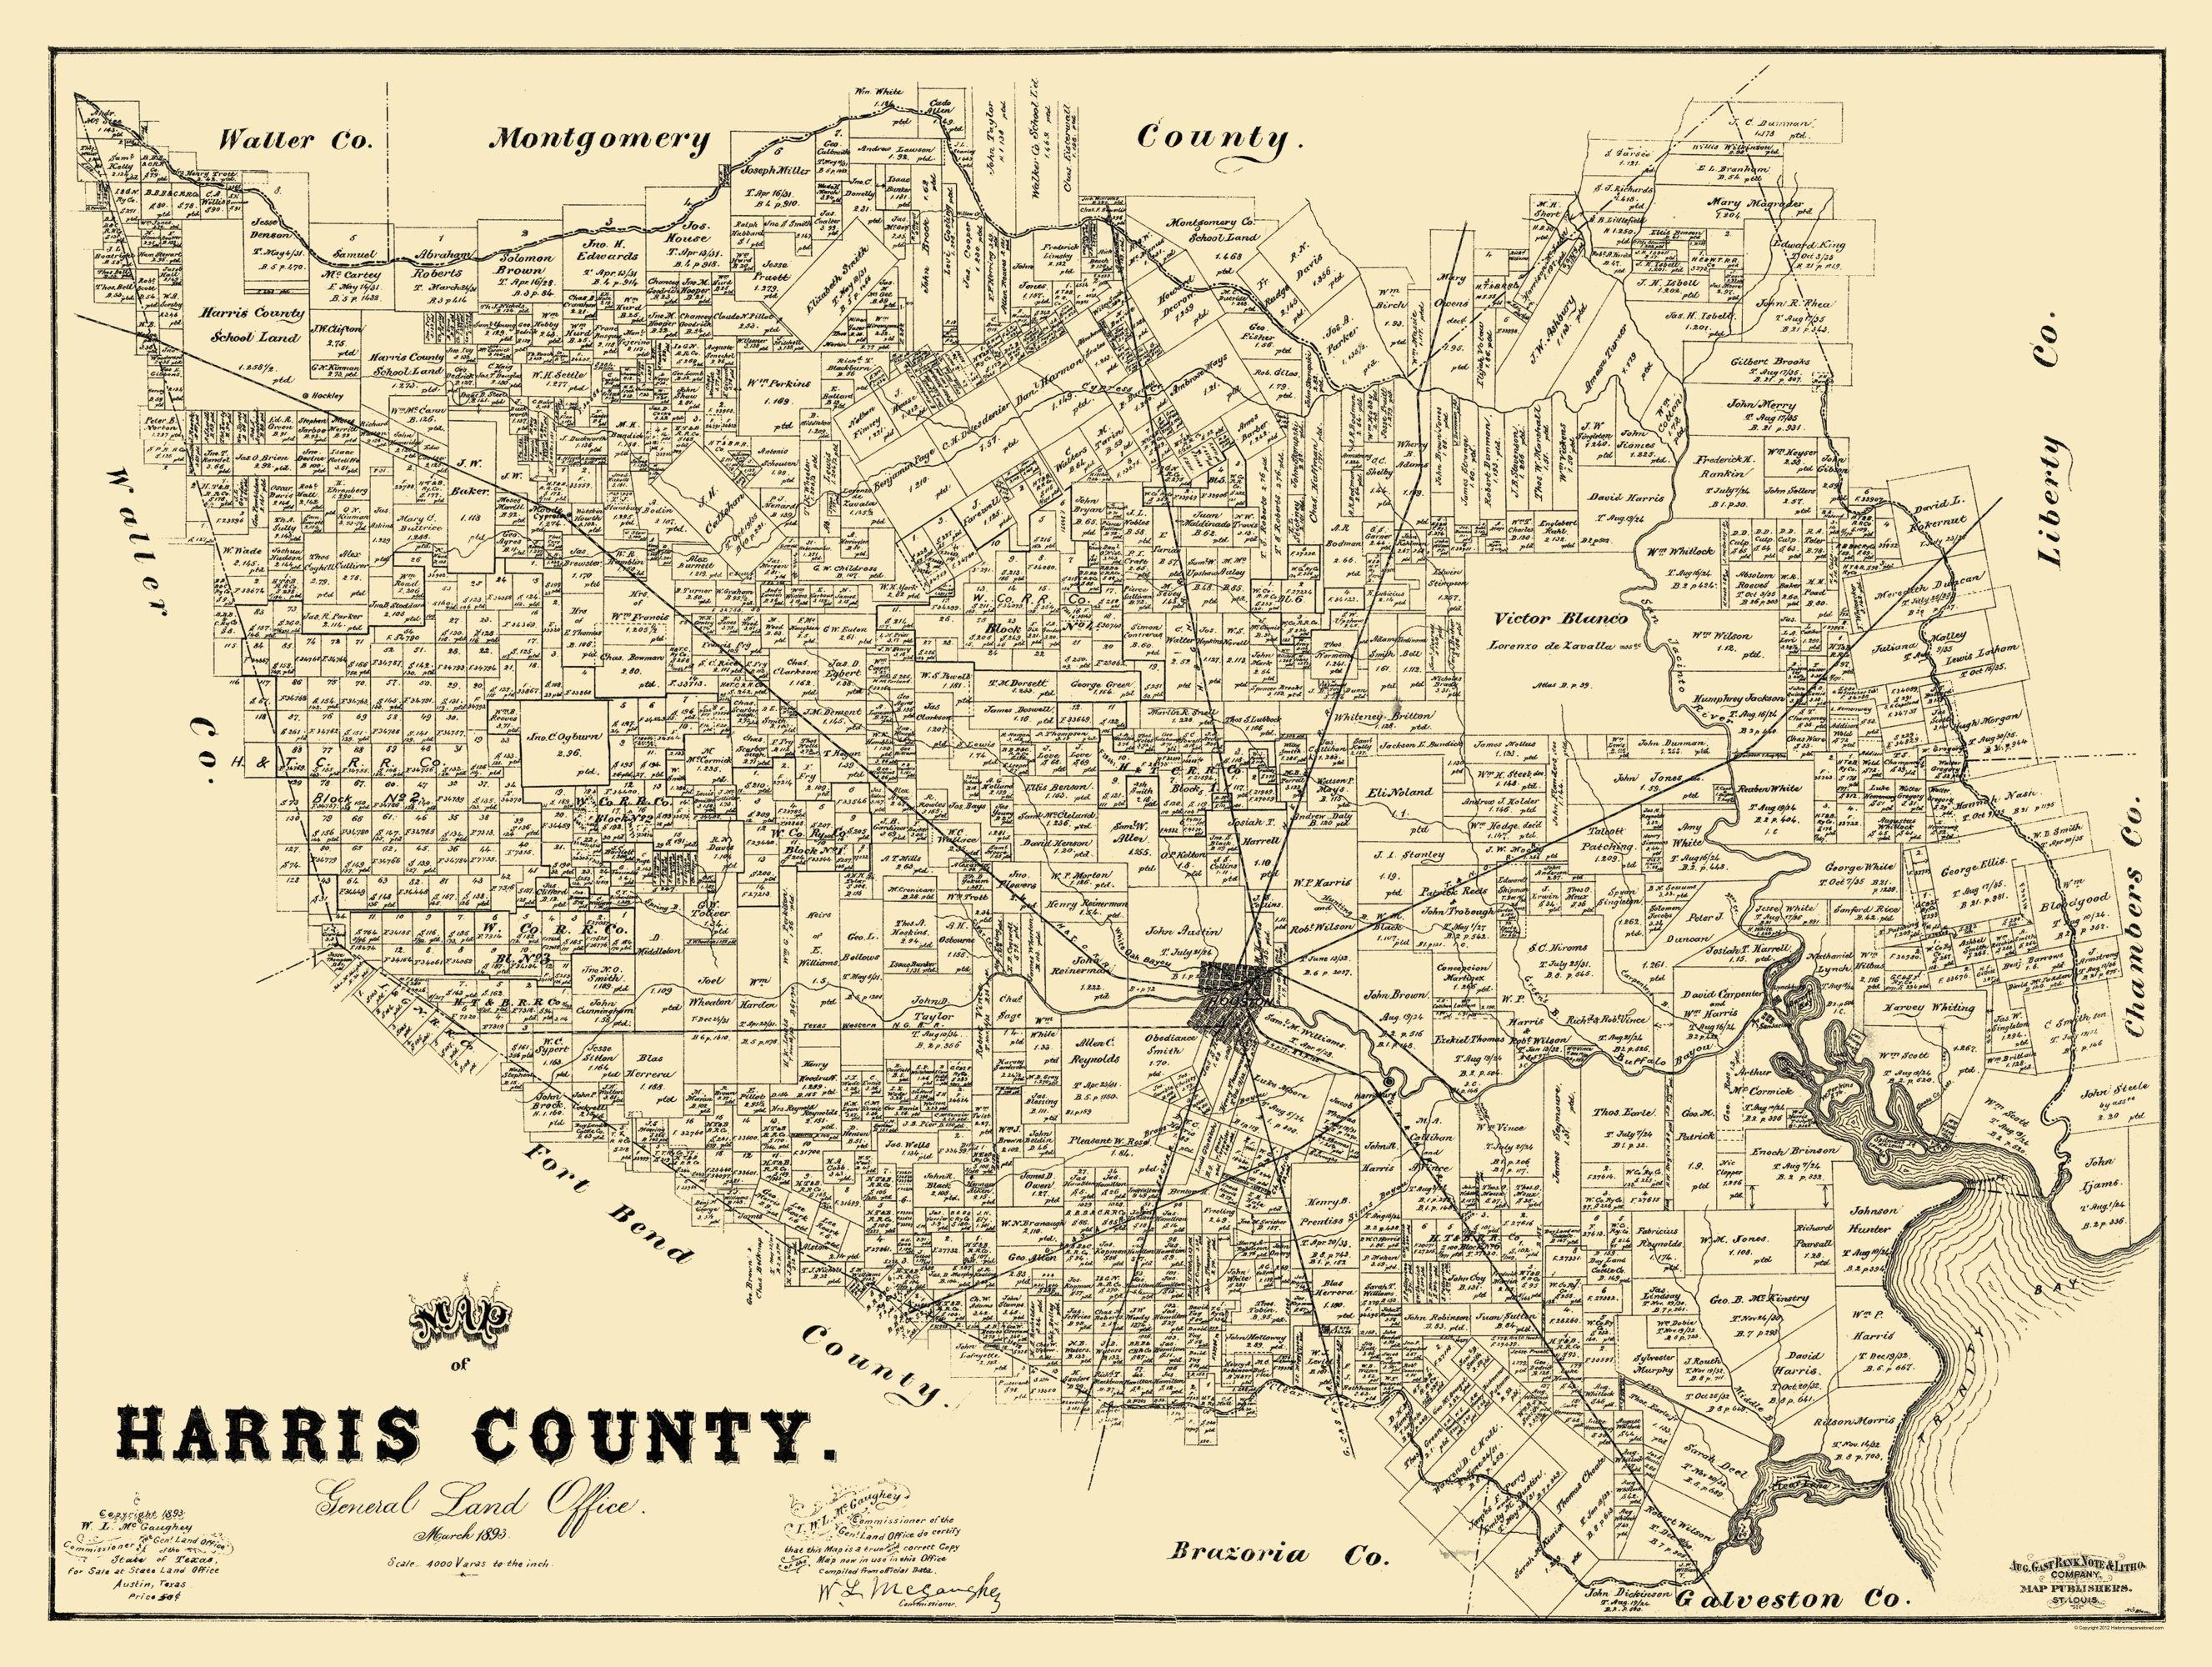 Old County Map - Harris Texas Landowner - 1893 - 30.5 x 23 ... on